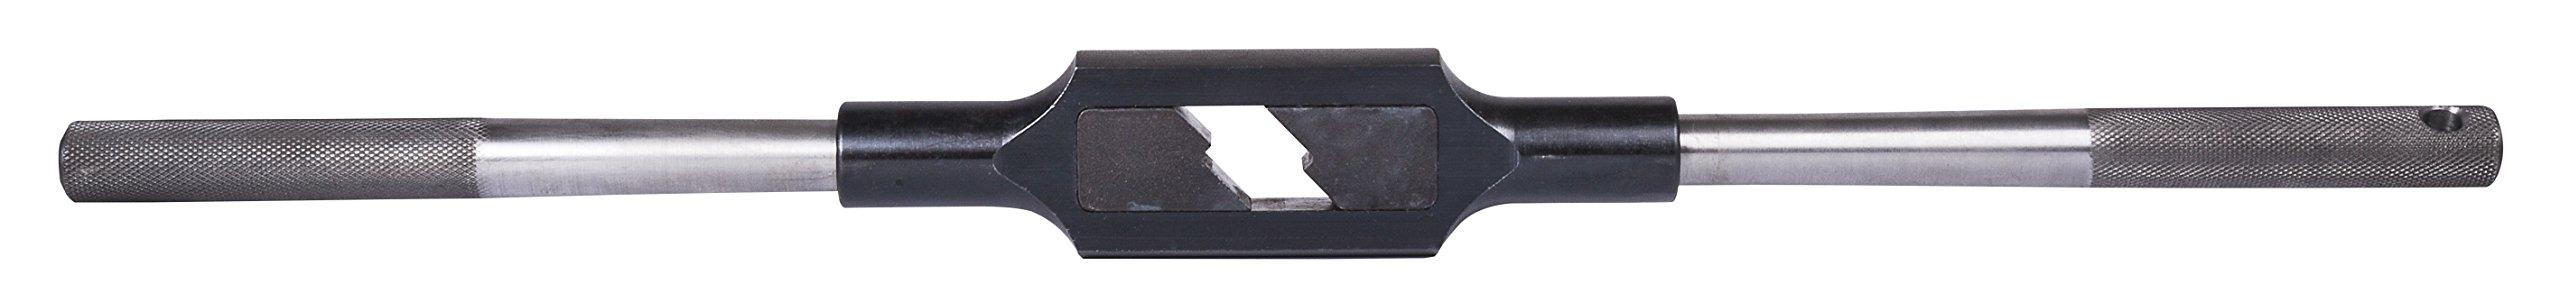 Dormer 3850N11 Tap Wrench, Straight Handle, #11, Hand Reamer Capacity 3/8'' - 3/4'', Hand Tap Capacity 3/8'' - 1'', Full Length 20''